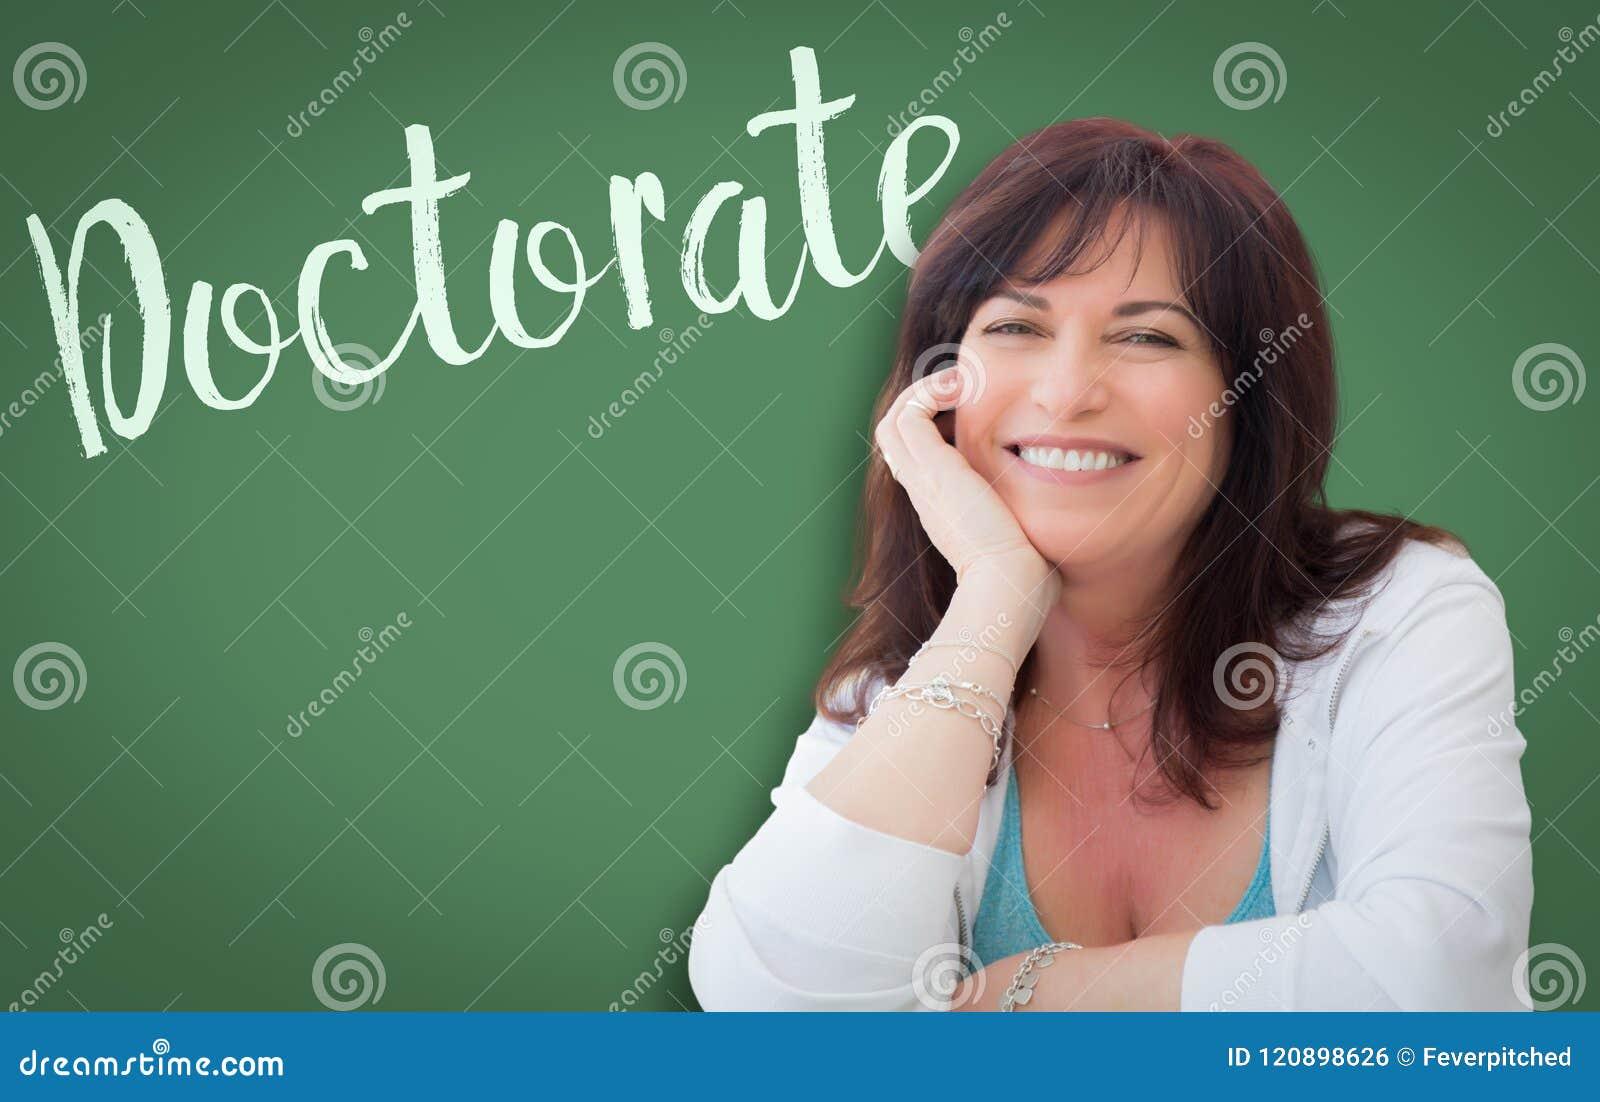 Doctorate Written On Green Chalkboard Behind Smiling Woman